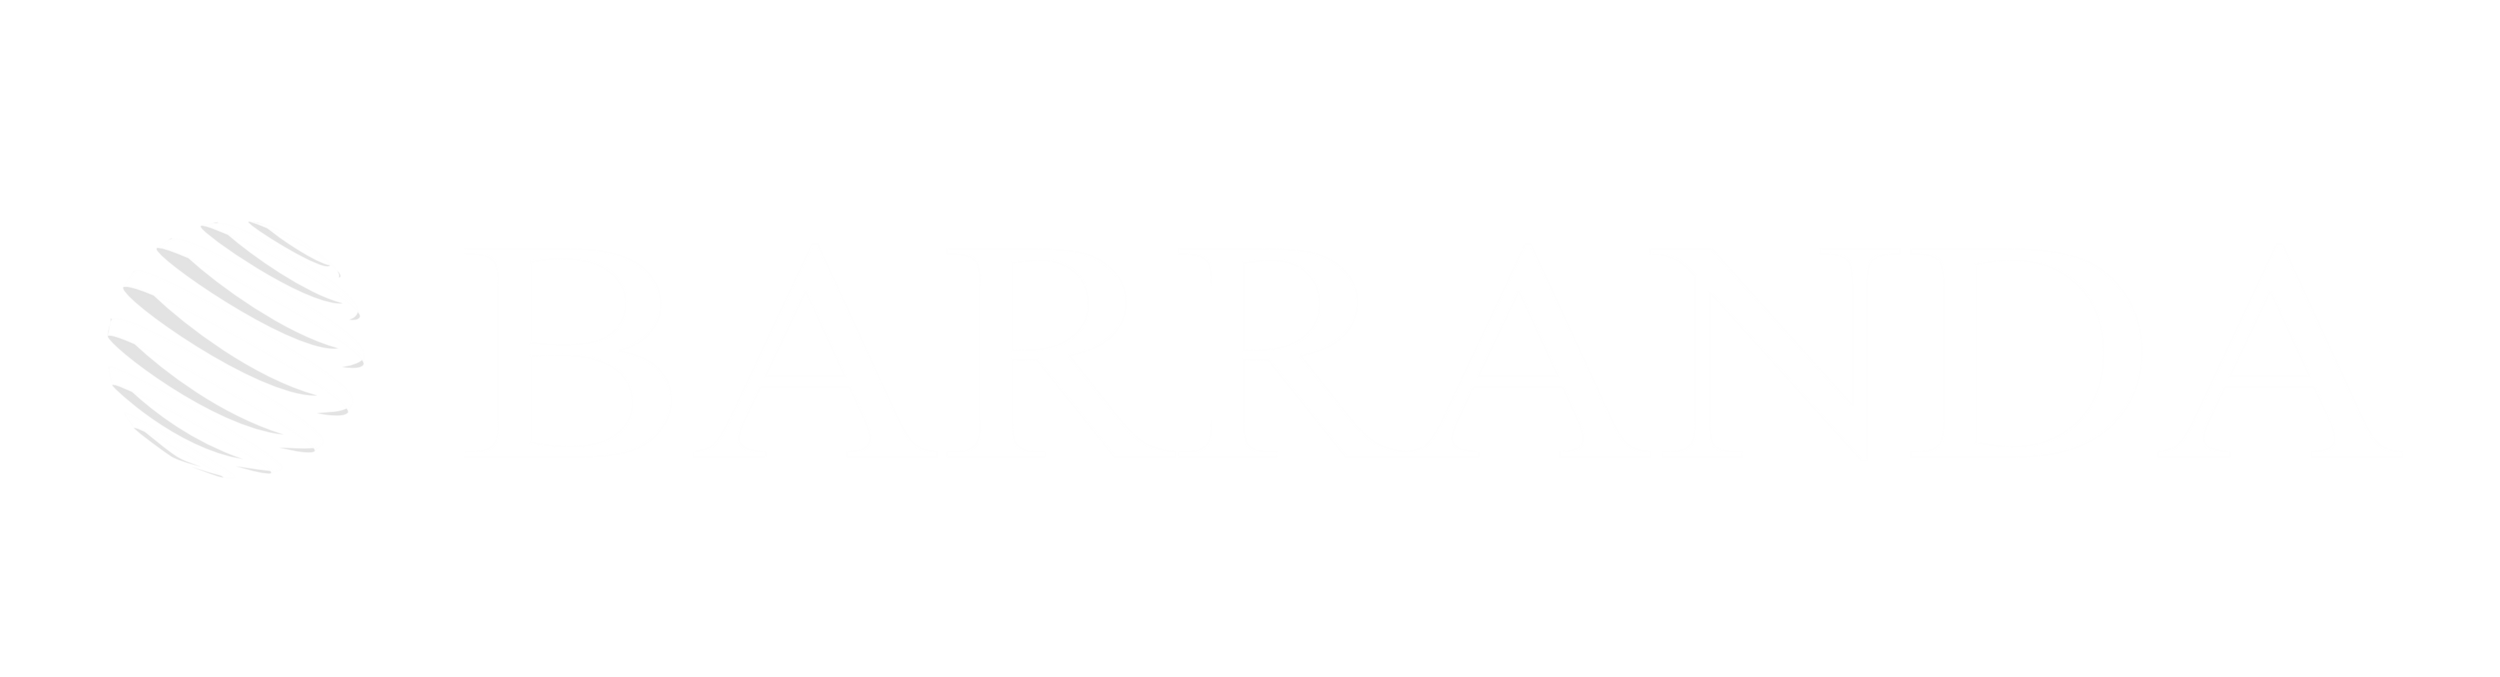 Logo Baranda Teste.png